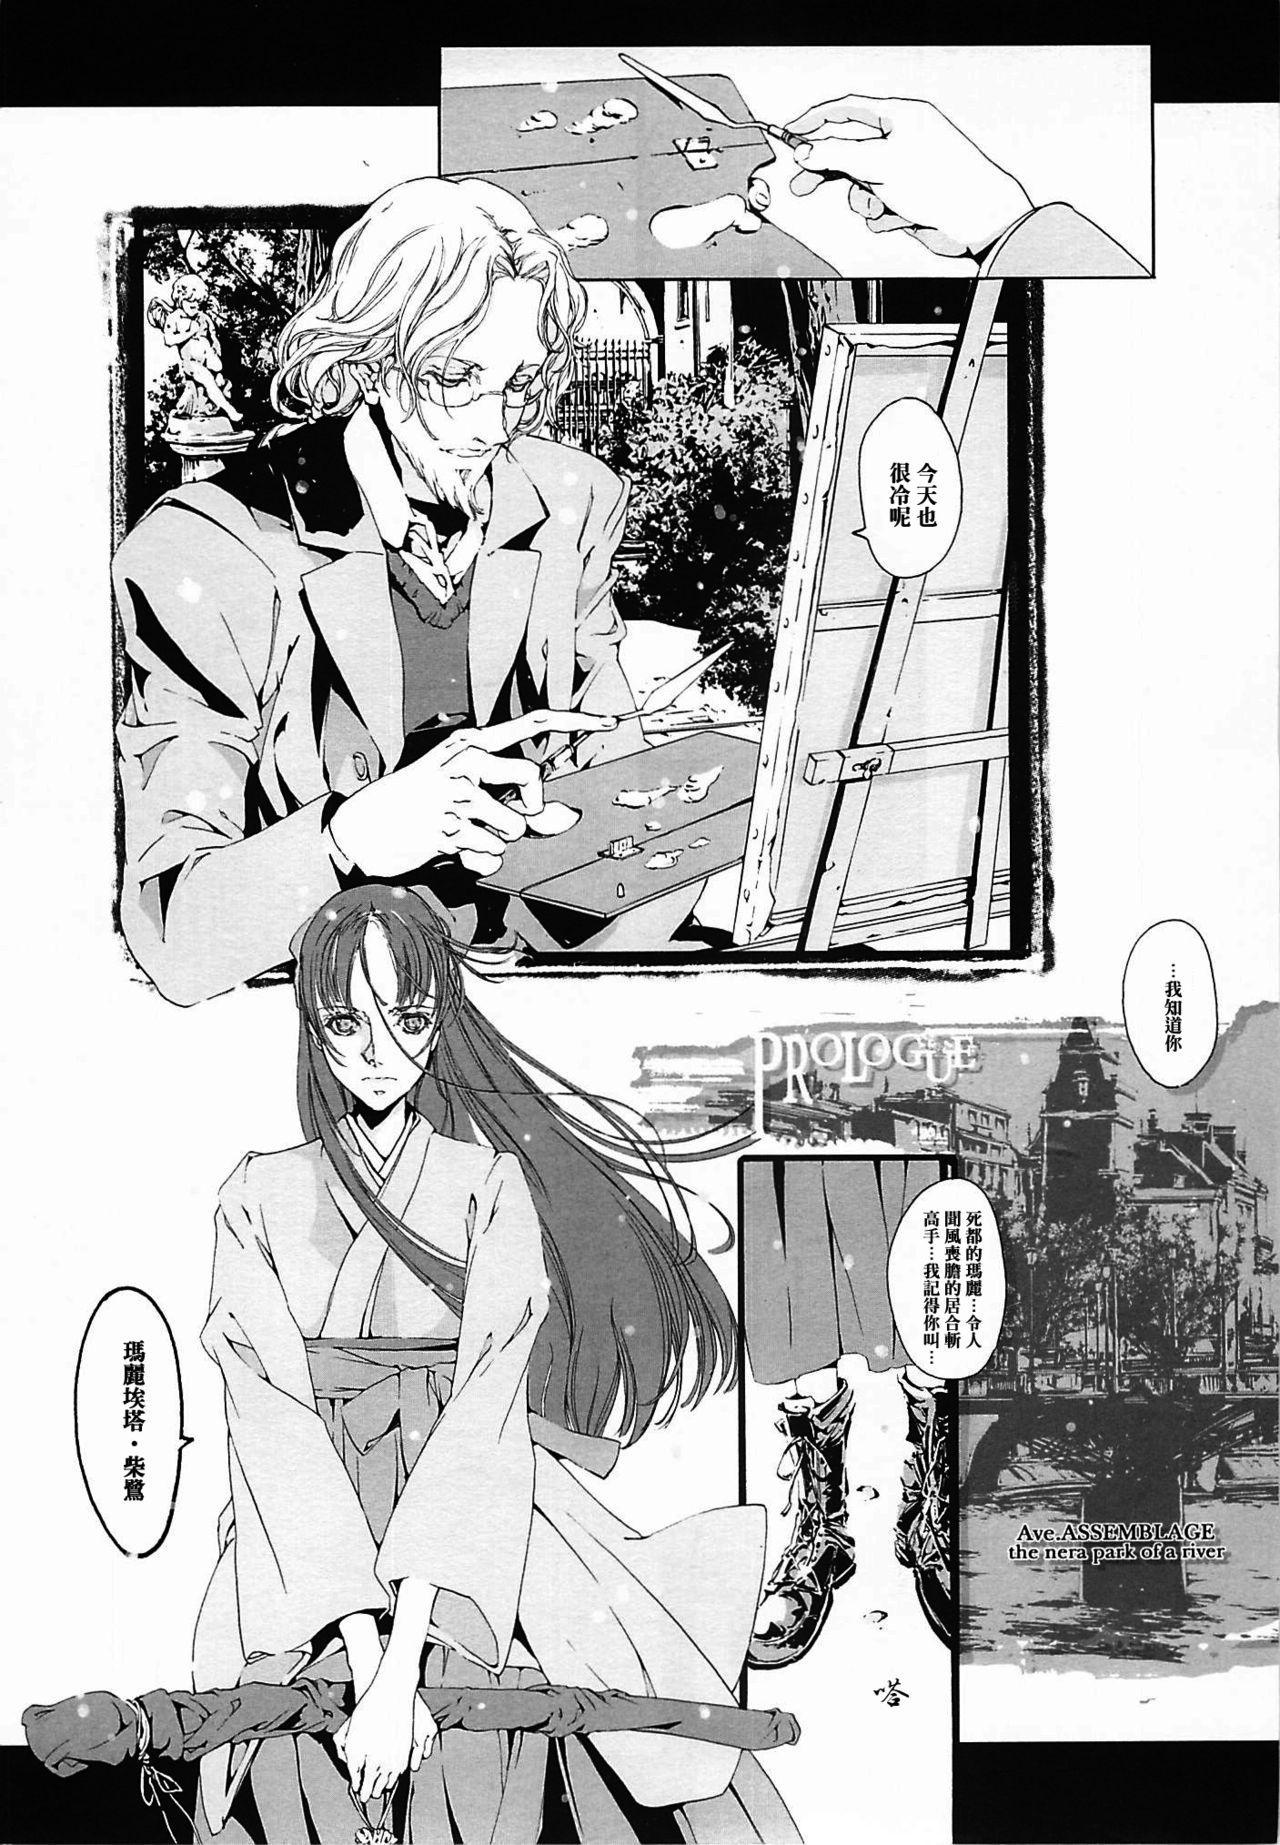 (CR37) [70 Nenshiki Yuukyuu Kikan (Endou Okito)] ORGAN-Tino  01-02[Chinese] [拾荒者汉化组] [Incomplete] 12